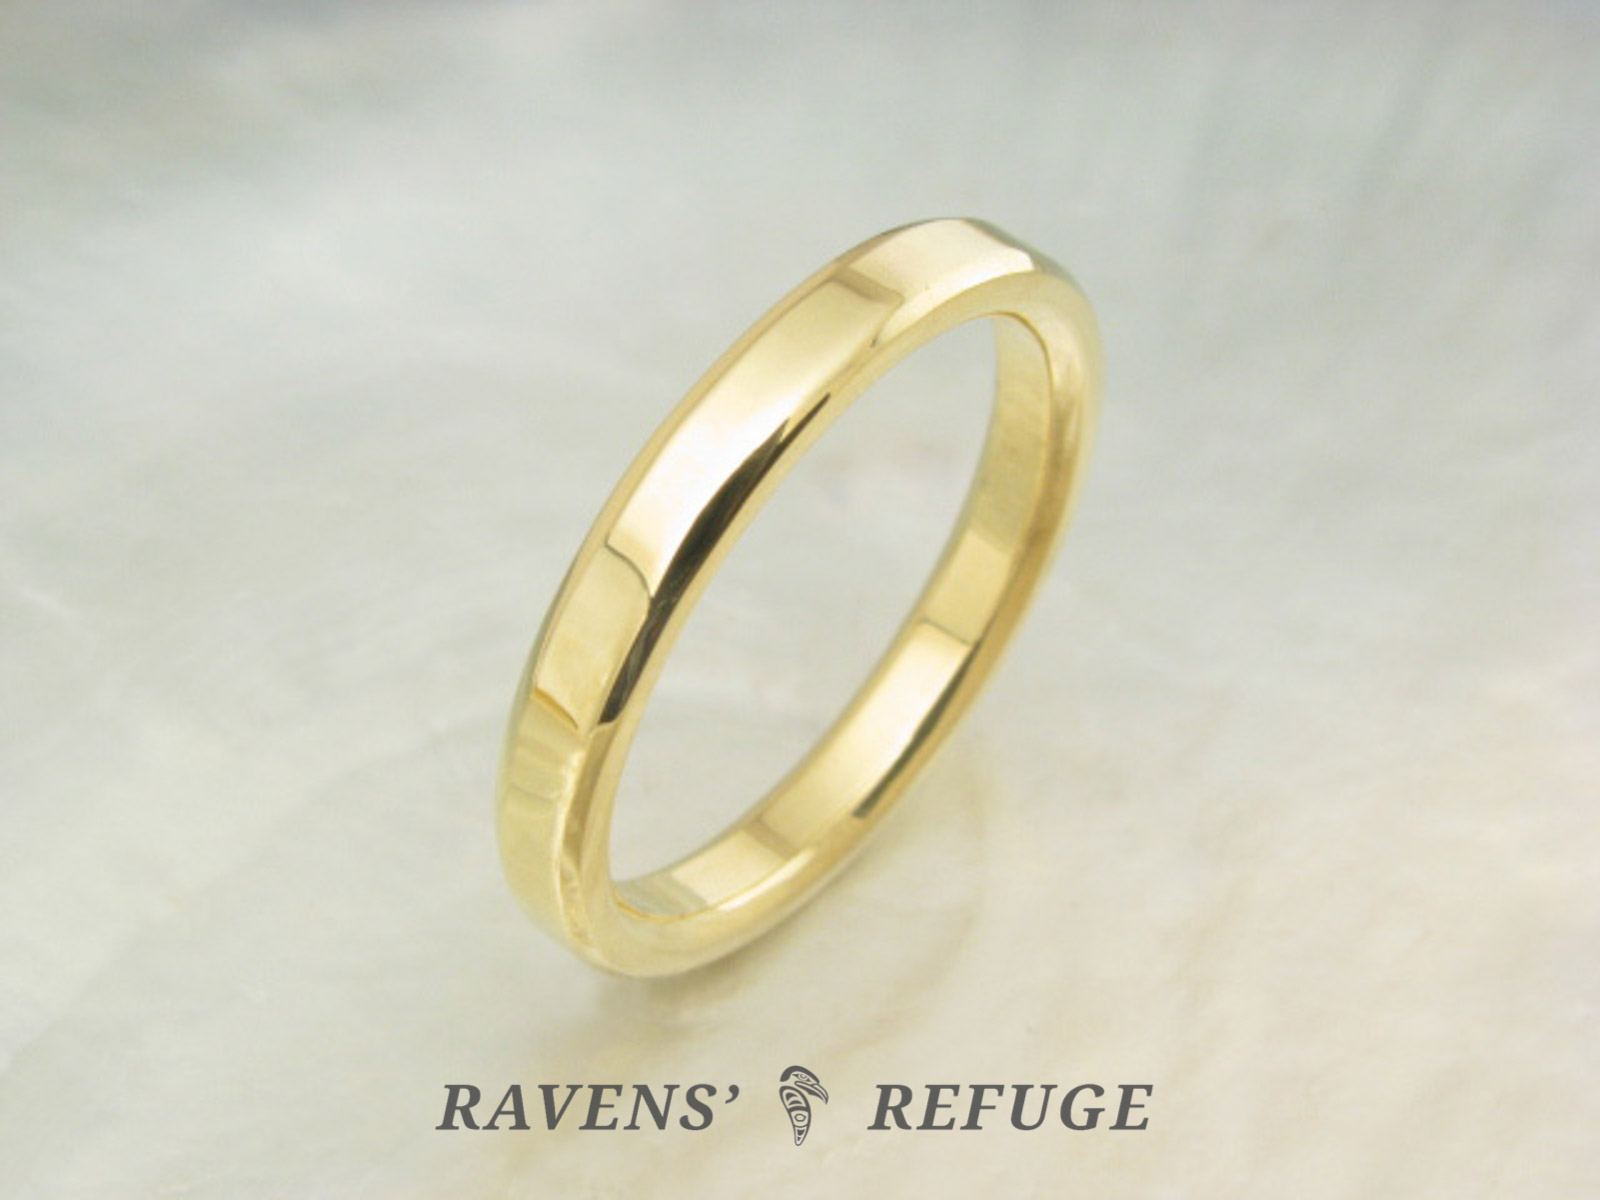 simple wedding ring – hand forged gold band - Ravens' Refuge